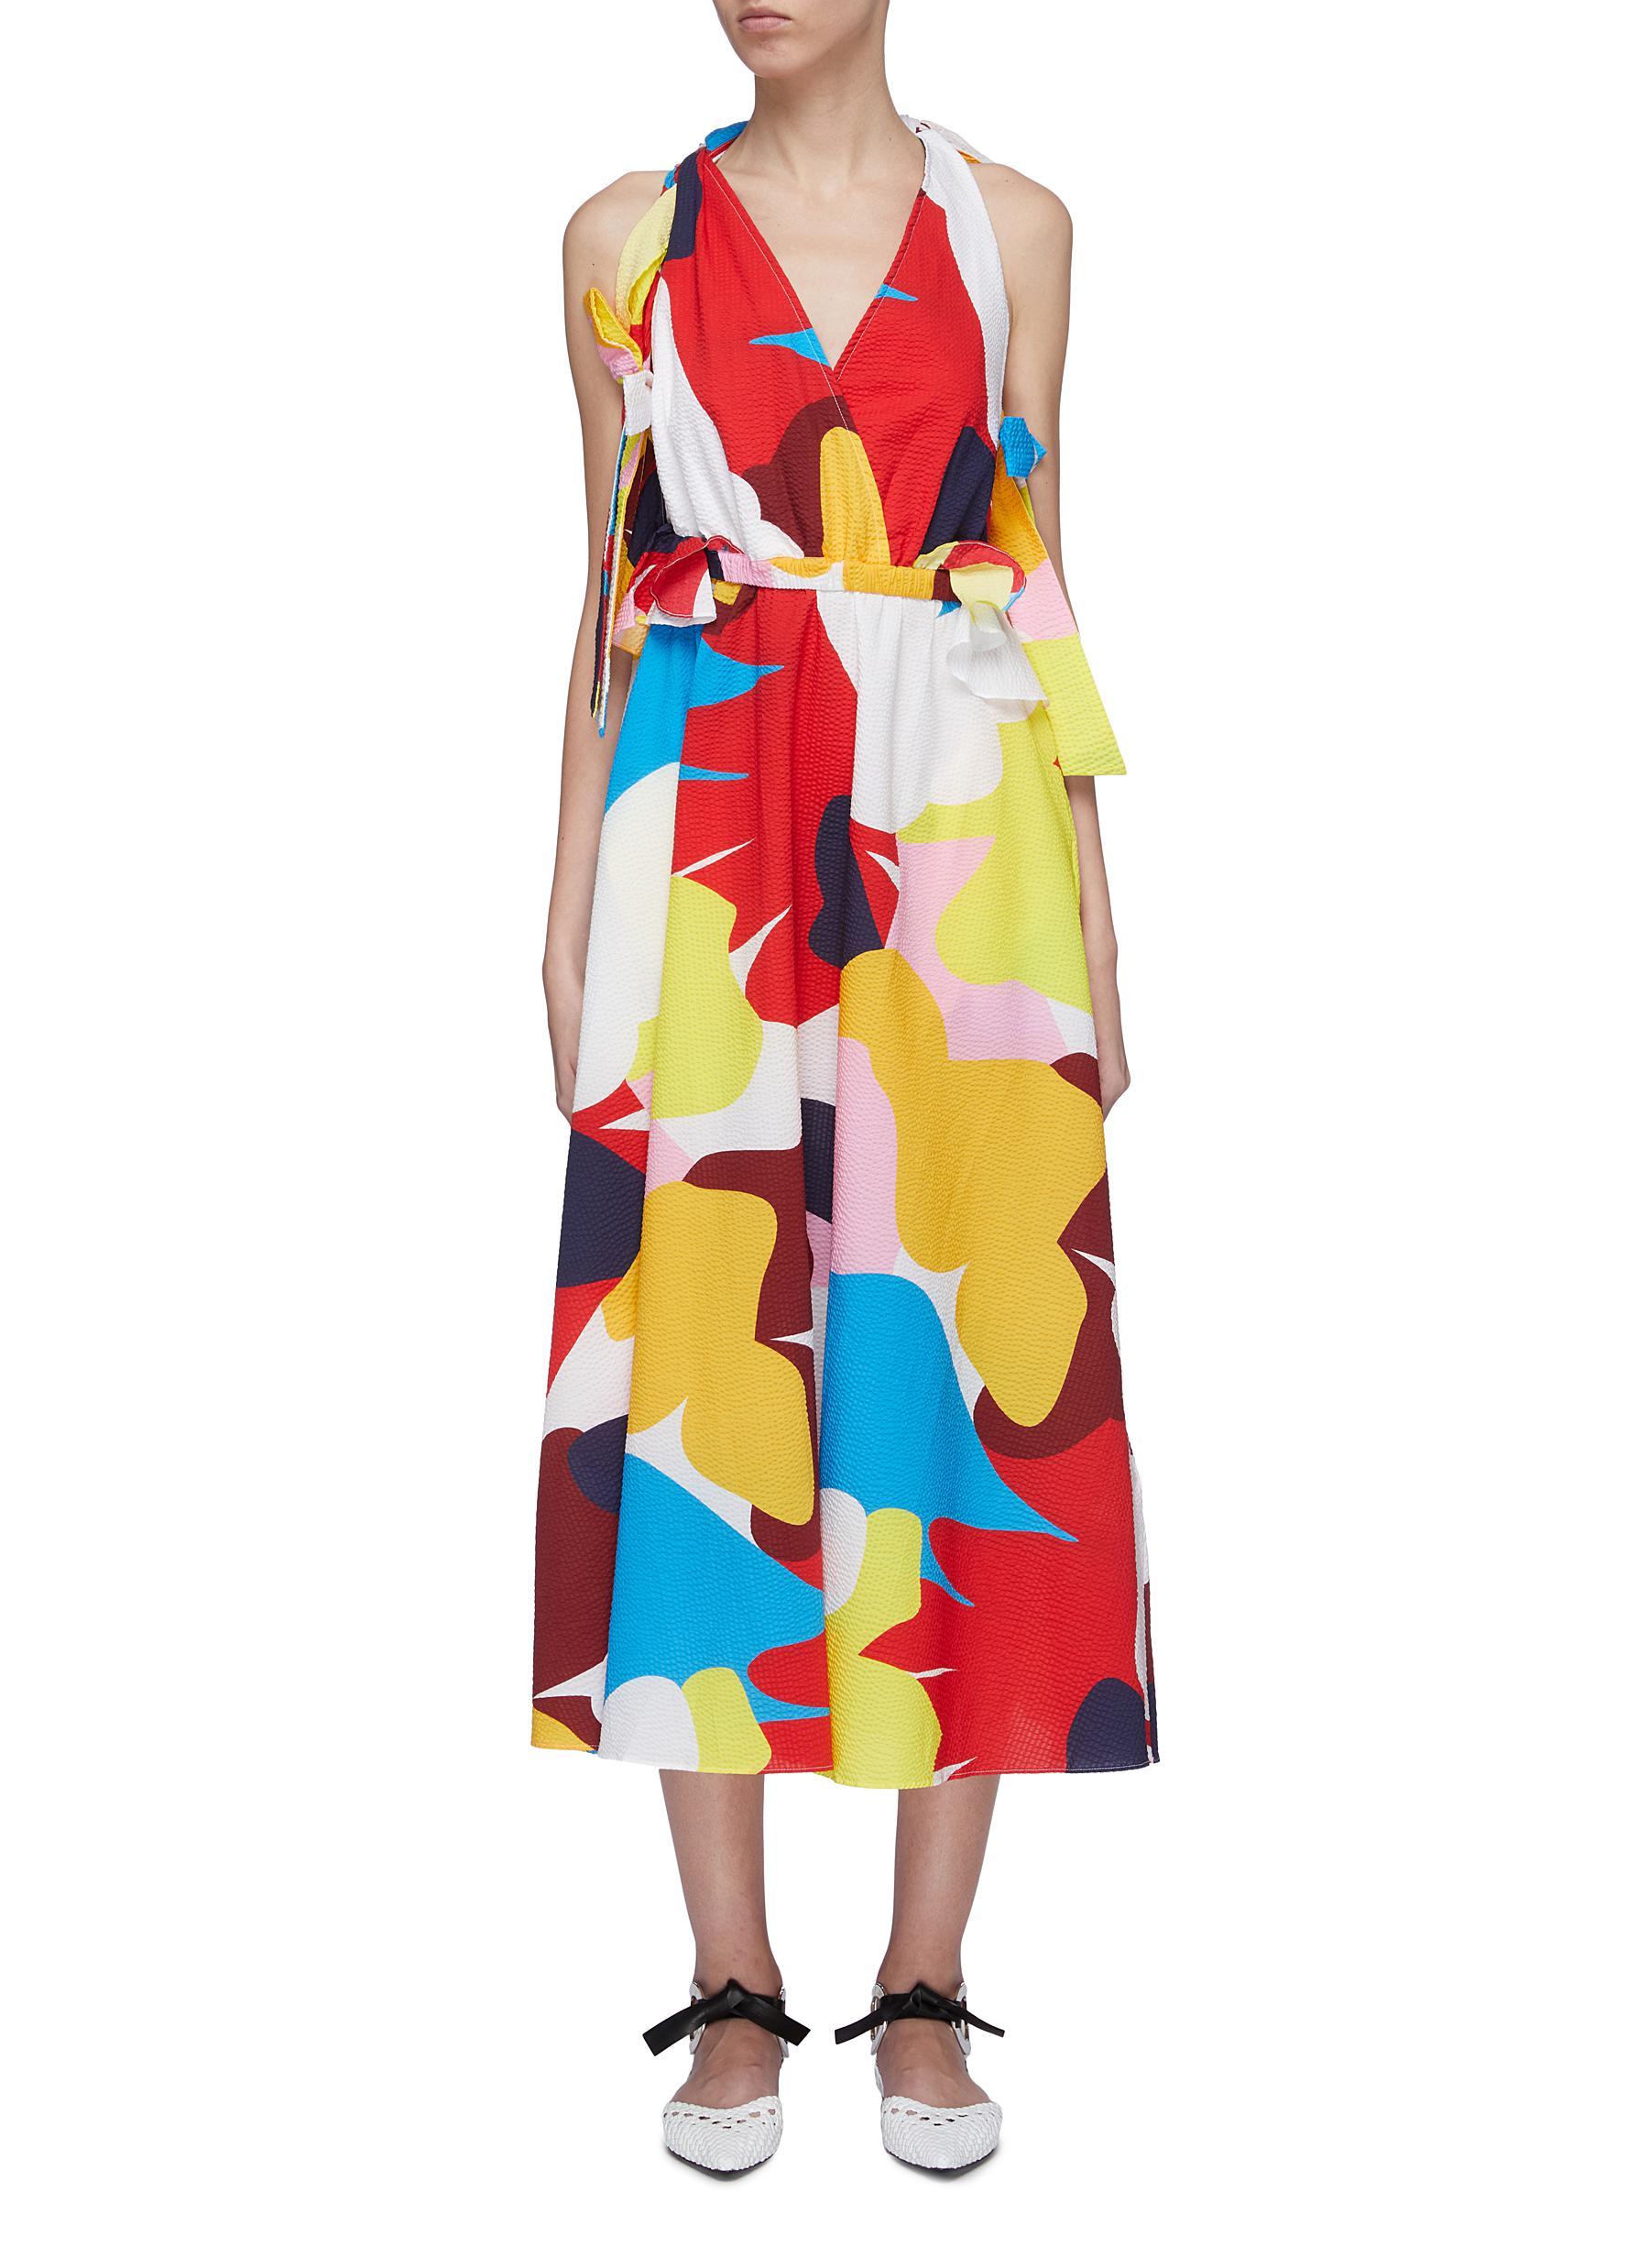 Cutout back bow abstract print dress by Minki